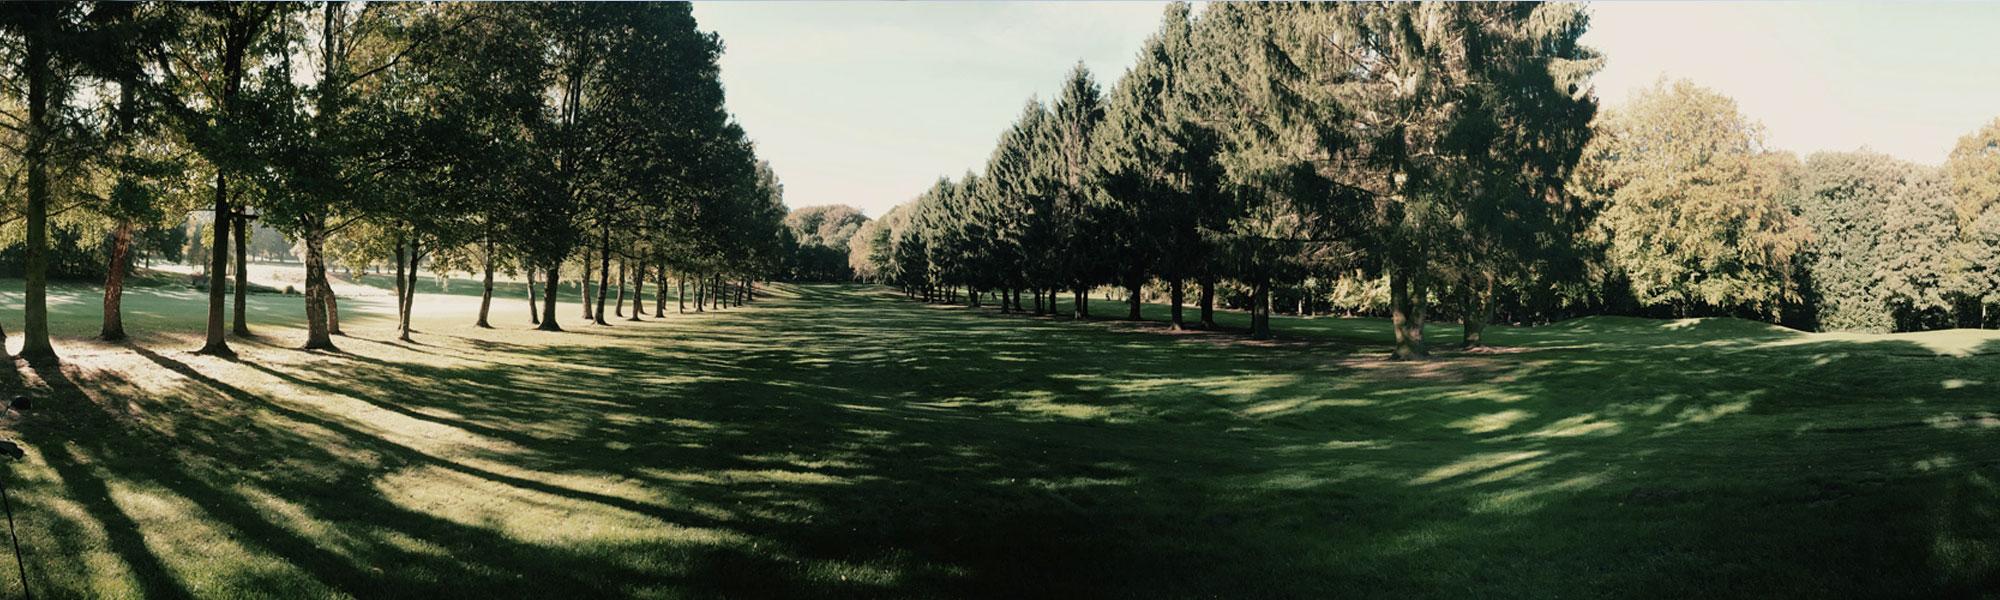 Golfplatz Panorama